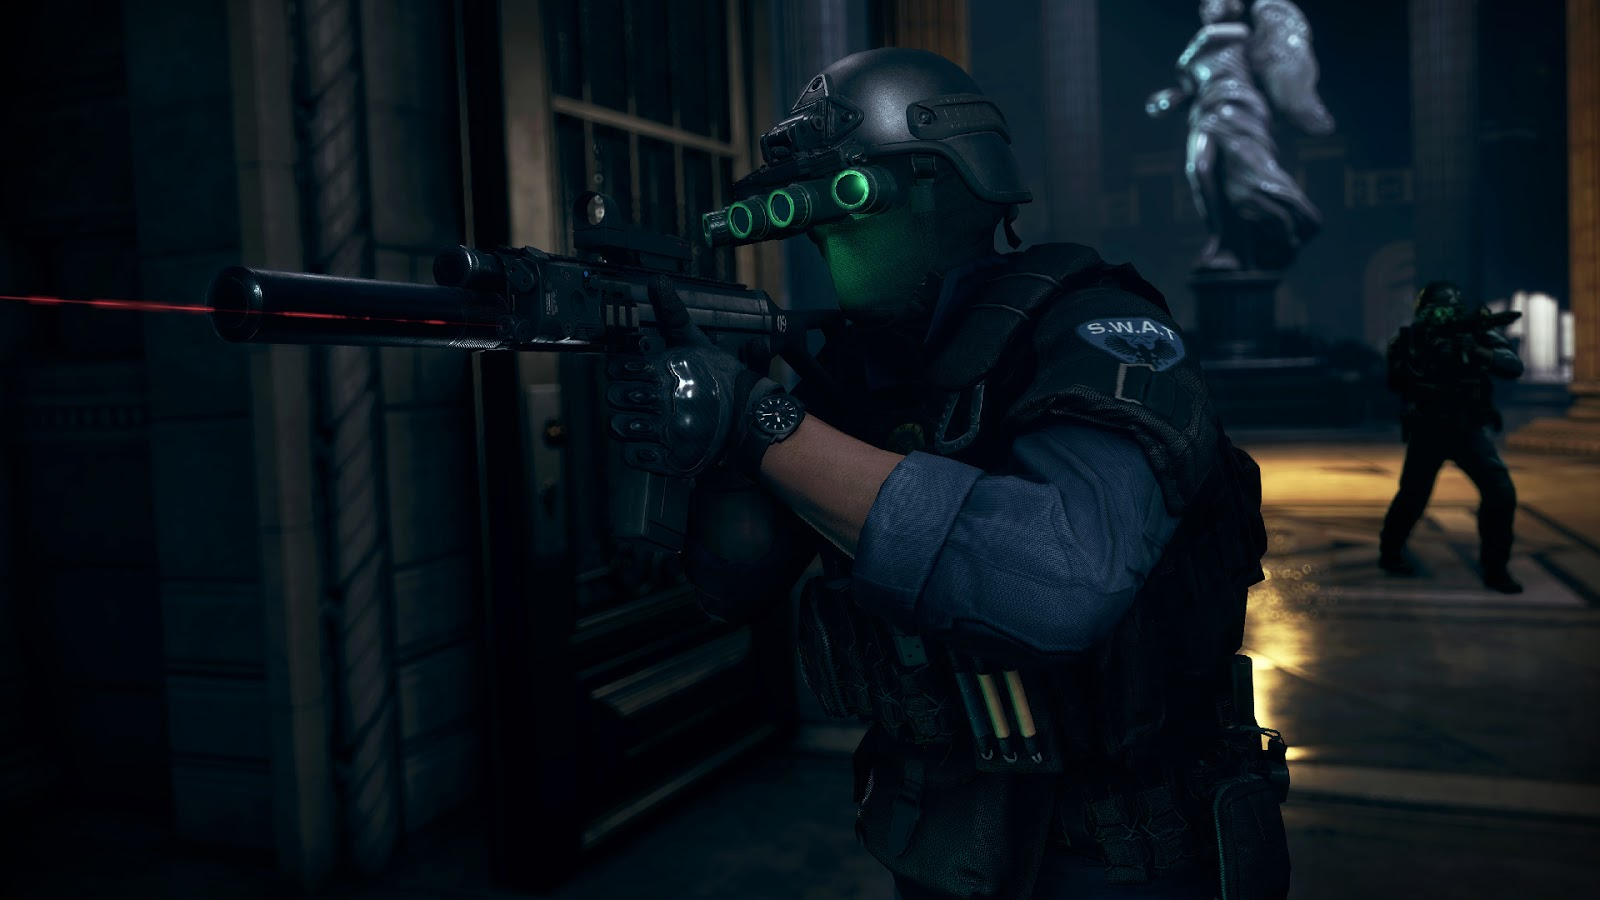 Visceral anuncia o DLC gratuito Battlefield Hardline: Blackout